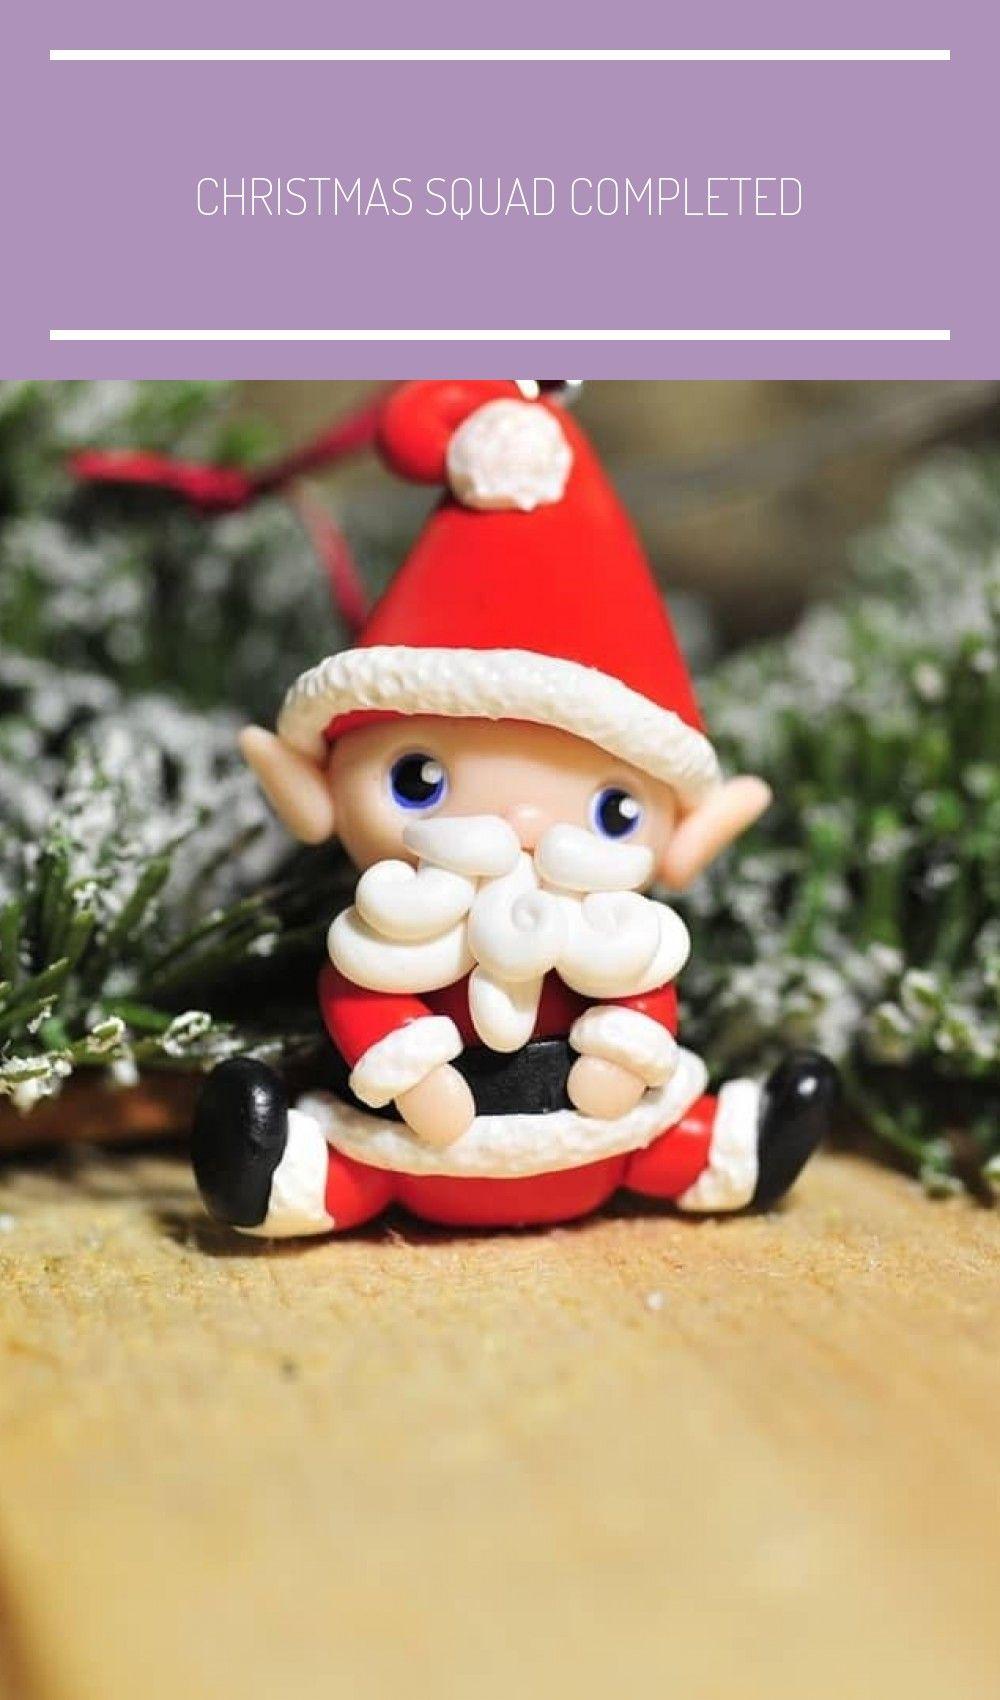 Christmas squad completed Only on www.littlebigdreams.it . . . . Squadra natalizia completata Li trovi solo su www.littlebigdreams.it . . . .  #polymerclay #creations #miniatures #Littlebigdreams #fimo #fimocreations #fimocreationshandmade #handmade #fimoart #pastapolimerica #creazioni #staedtler #magic #creativity #christmas #elf #santa #santaclaus #craft #hobby #homedecor #natale #present #regalodinatale #fimo creazioni natale